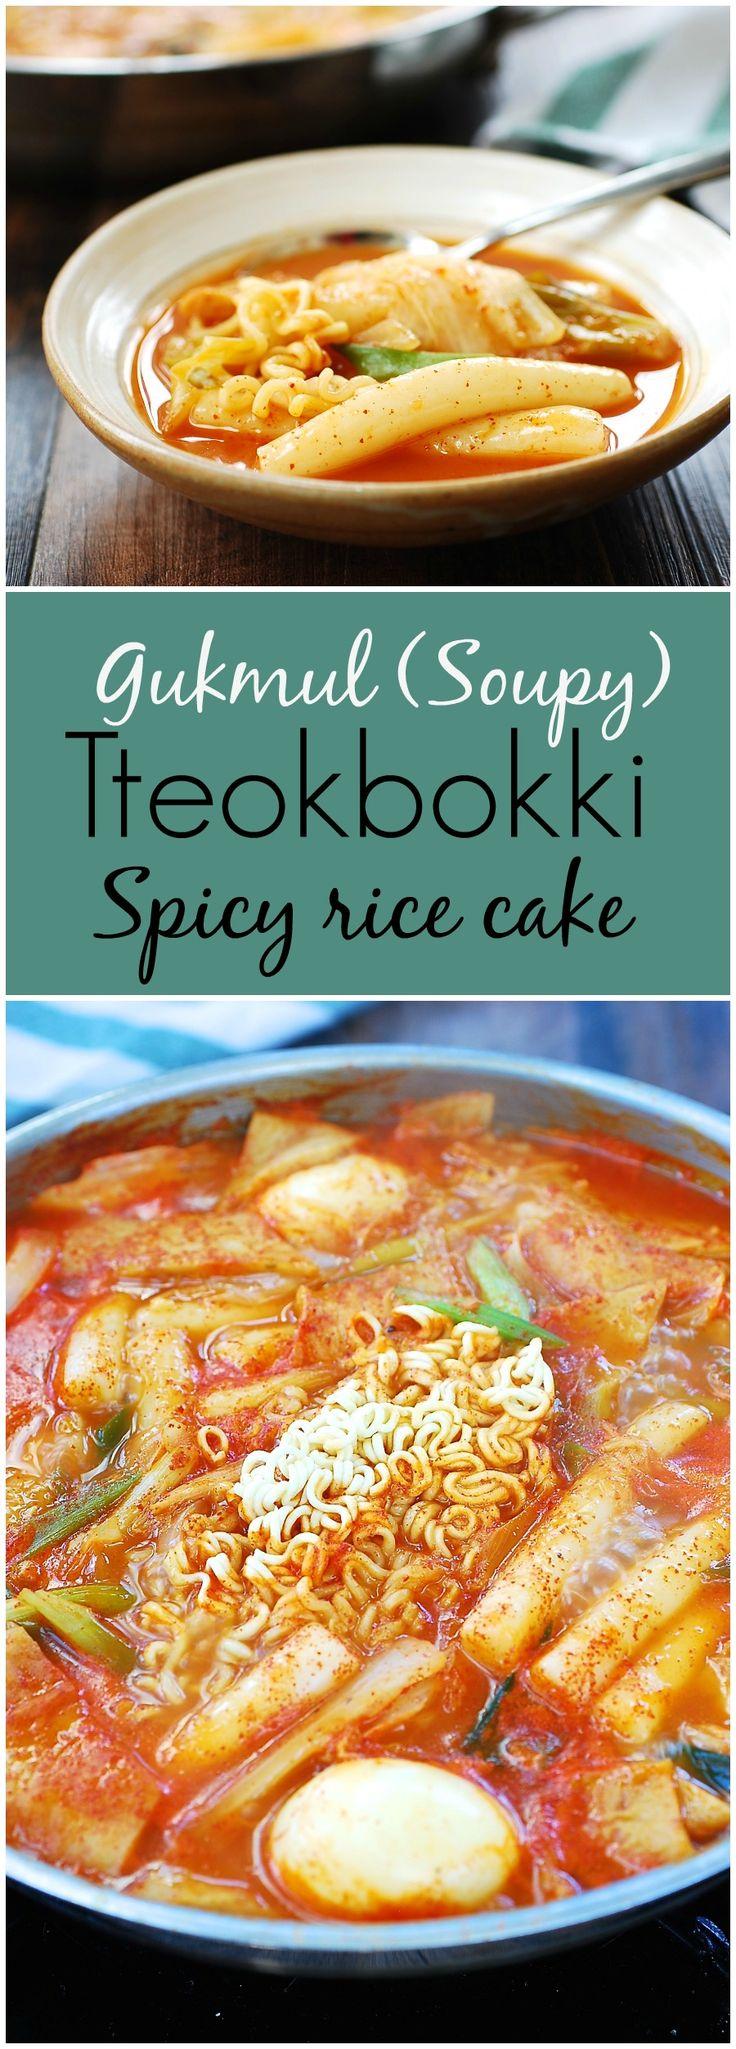 Blue apron korean rice cakes - Soupy Tteokbokki Spicy Braised Korean Rice Cakes In Flavorful Broth